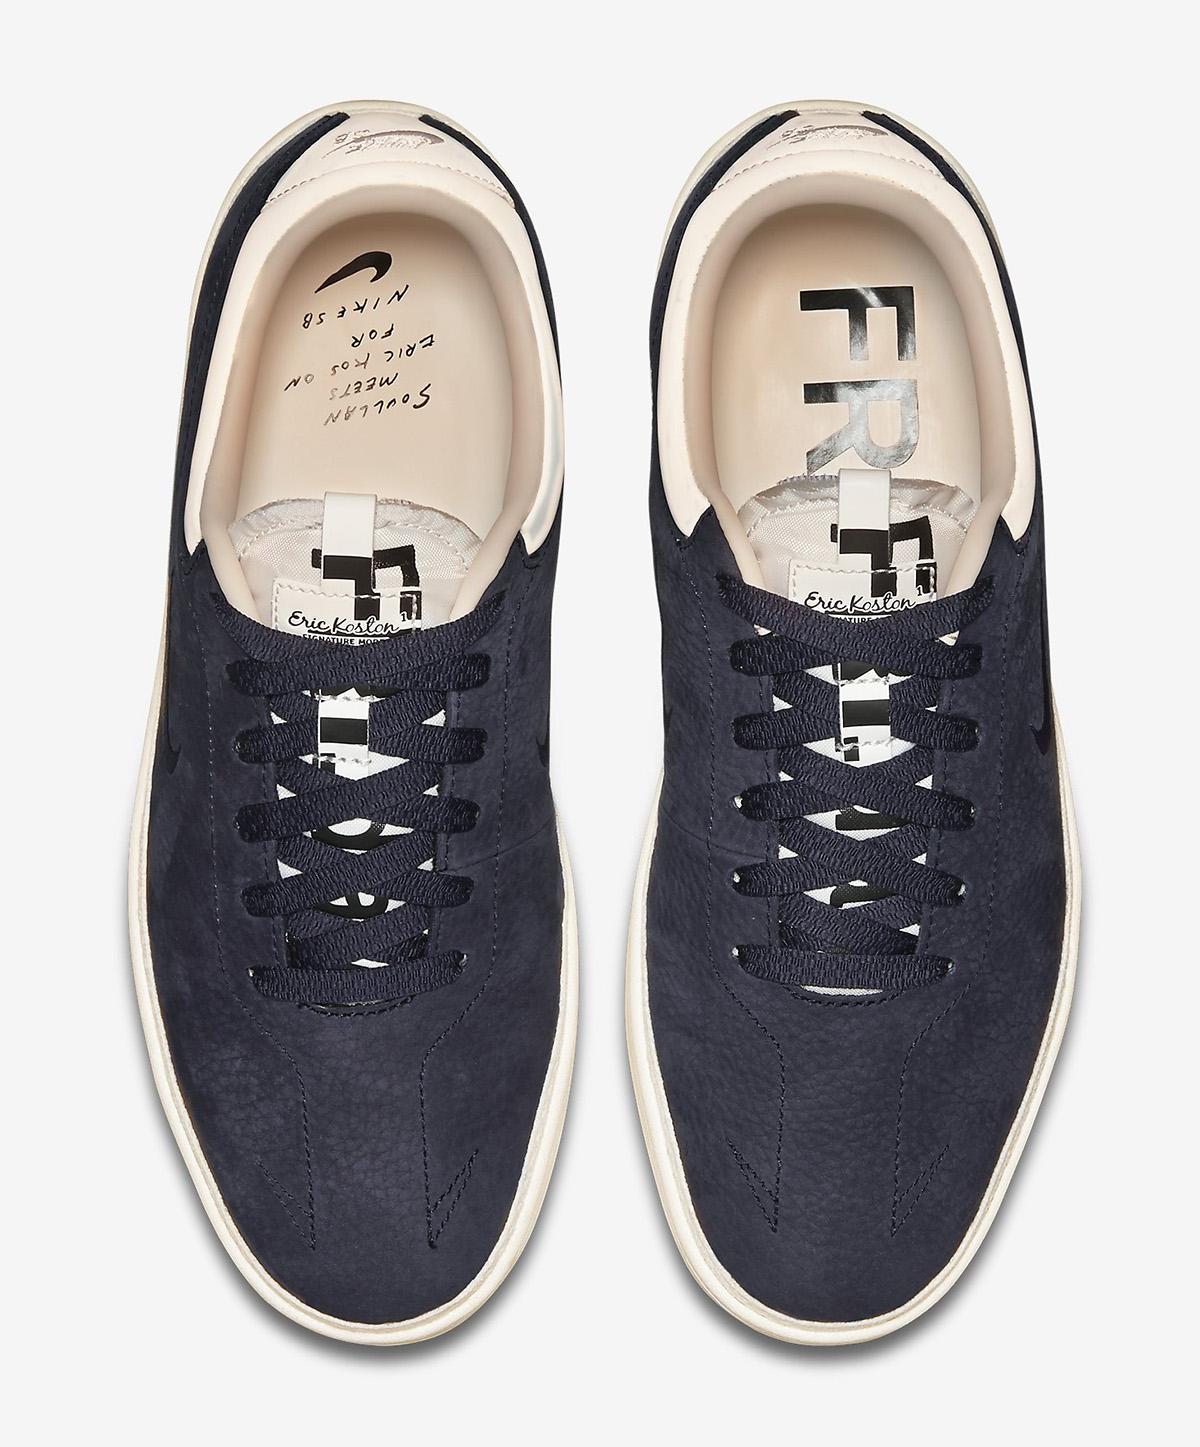 pretty nice df026 533cd ... QS Shoes - Obsidian Ivory Barley Orange  Soulland x Nike SB Zoom Eric  Koston .